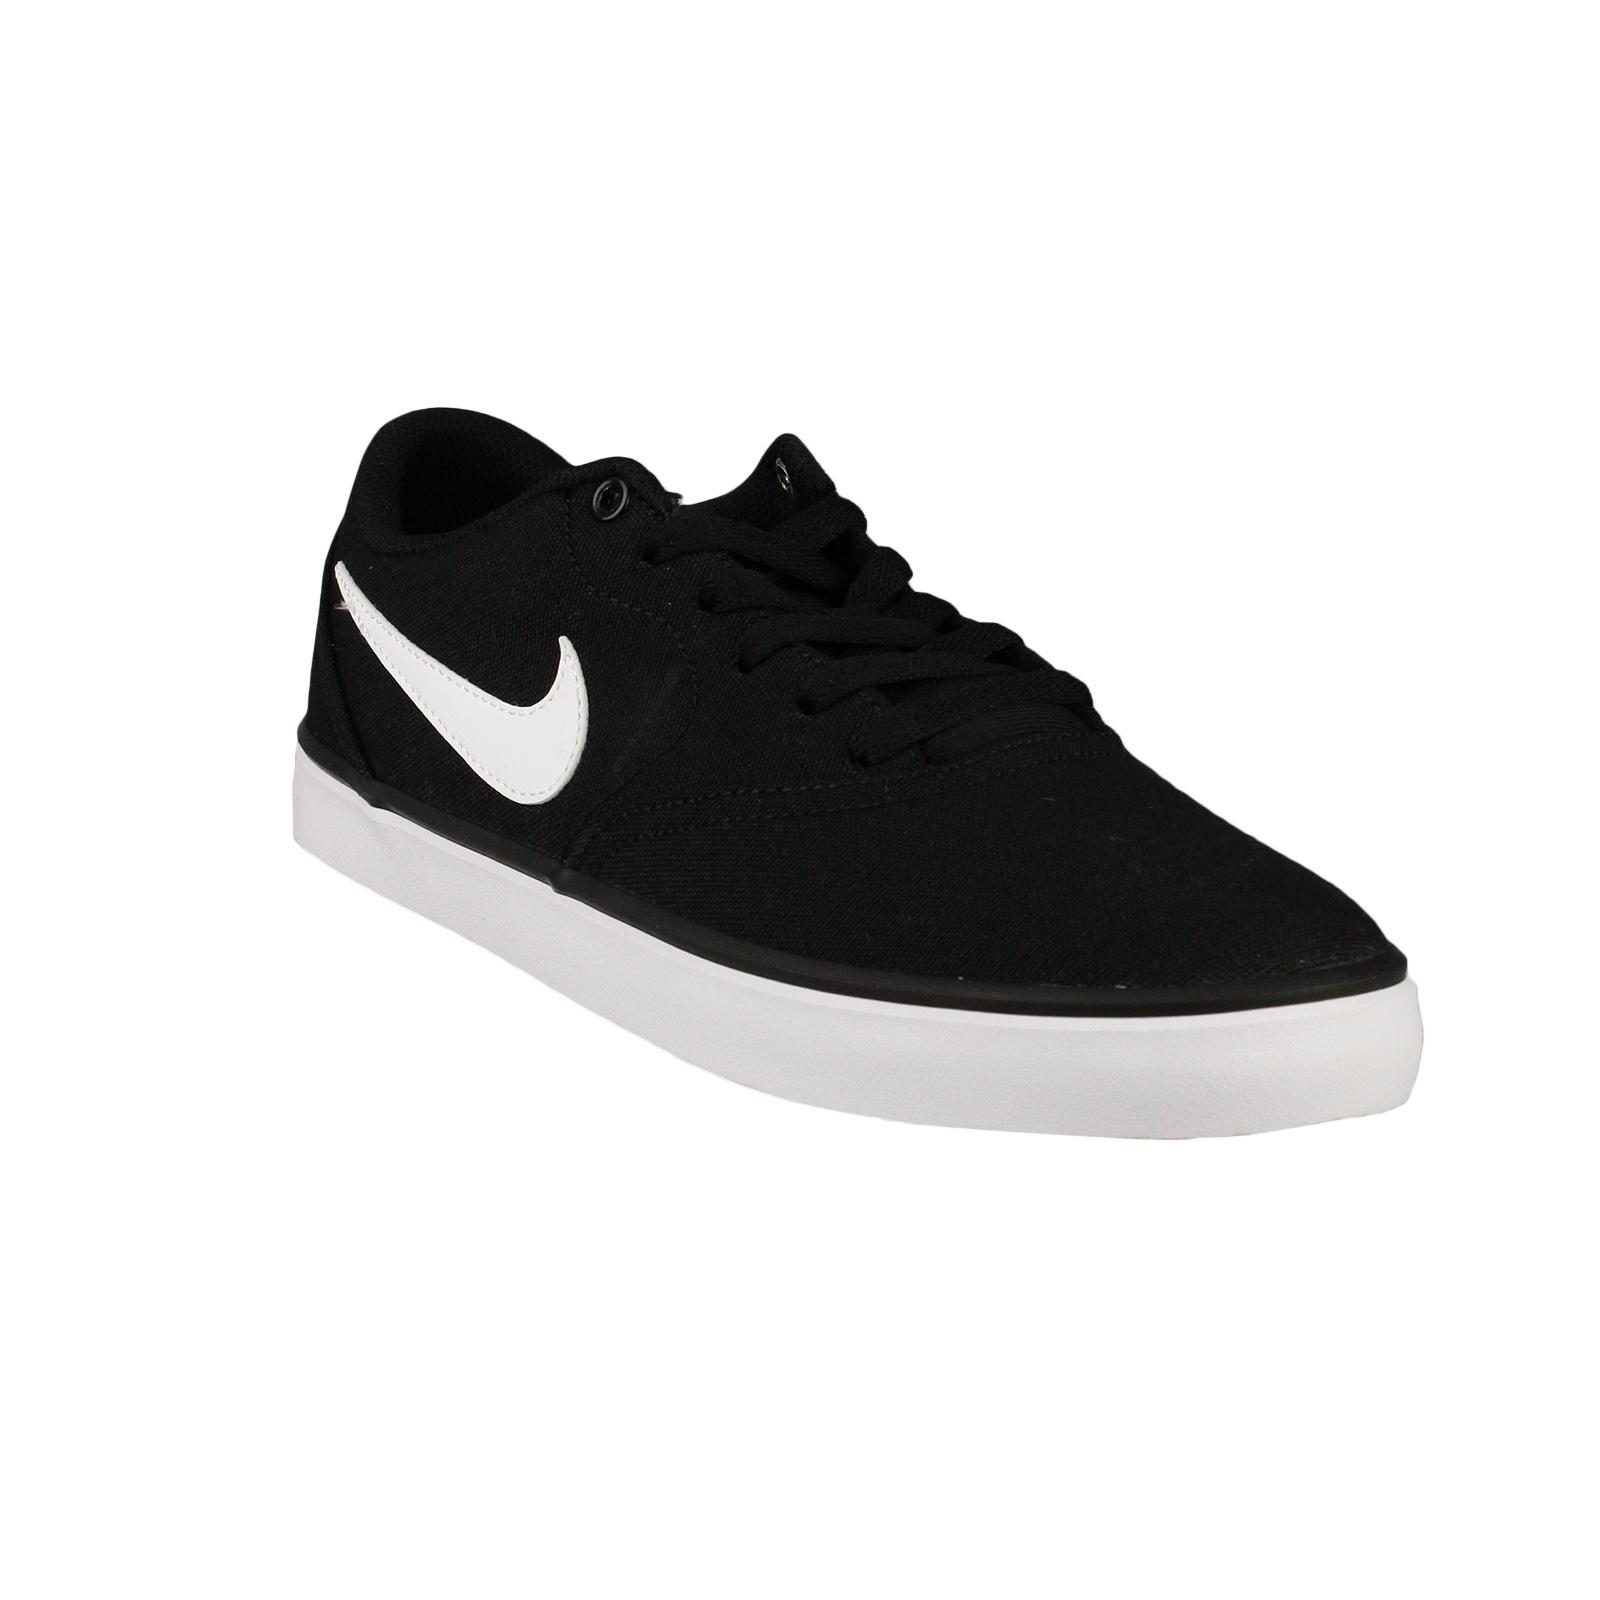 Pantofi sport barbati Nike SB Check Solarsoft Canvas 843896-001 ... dd5d0cd1e